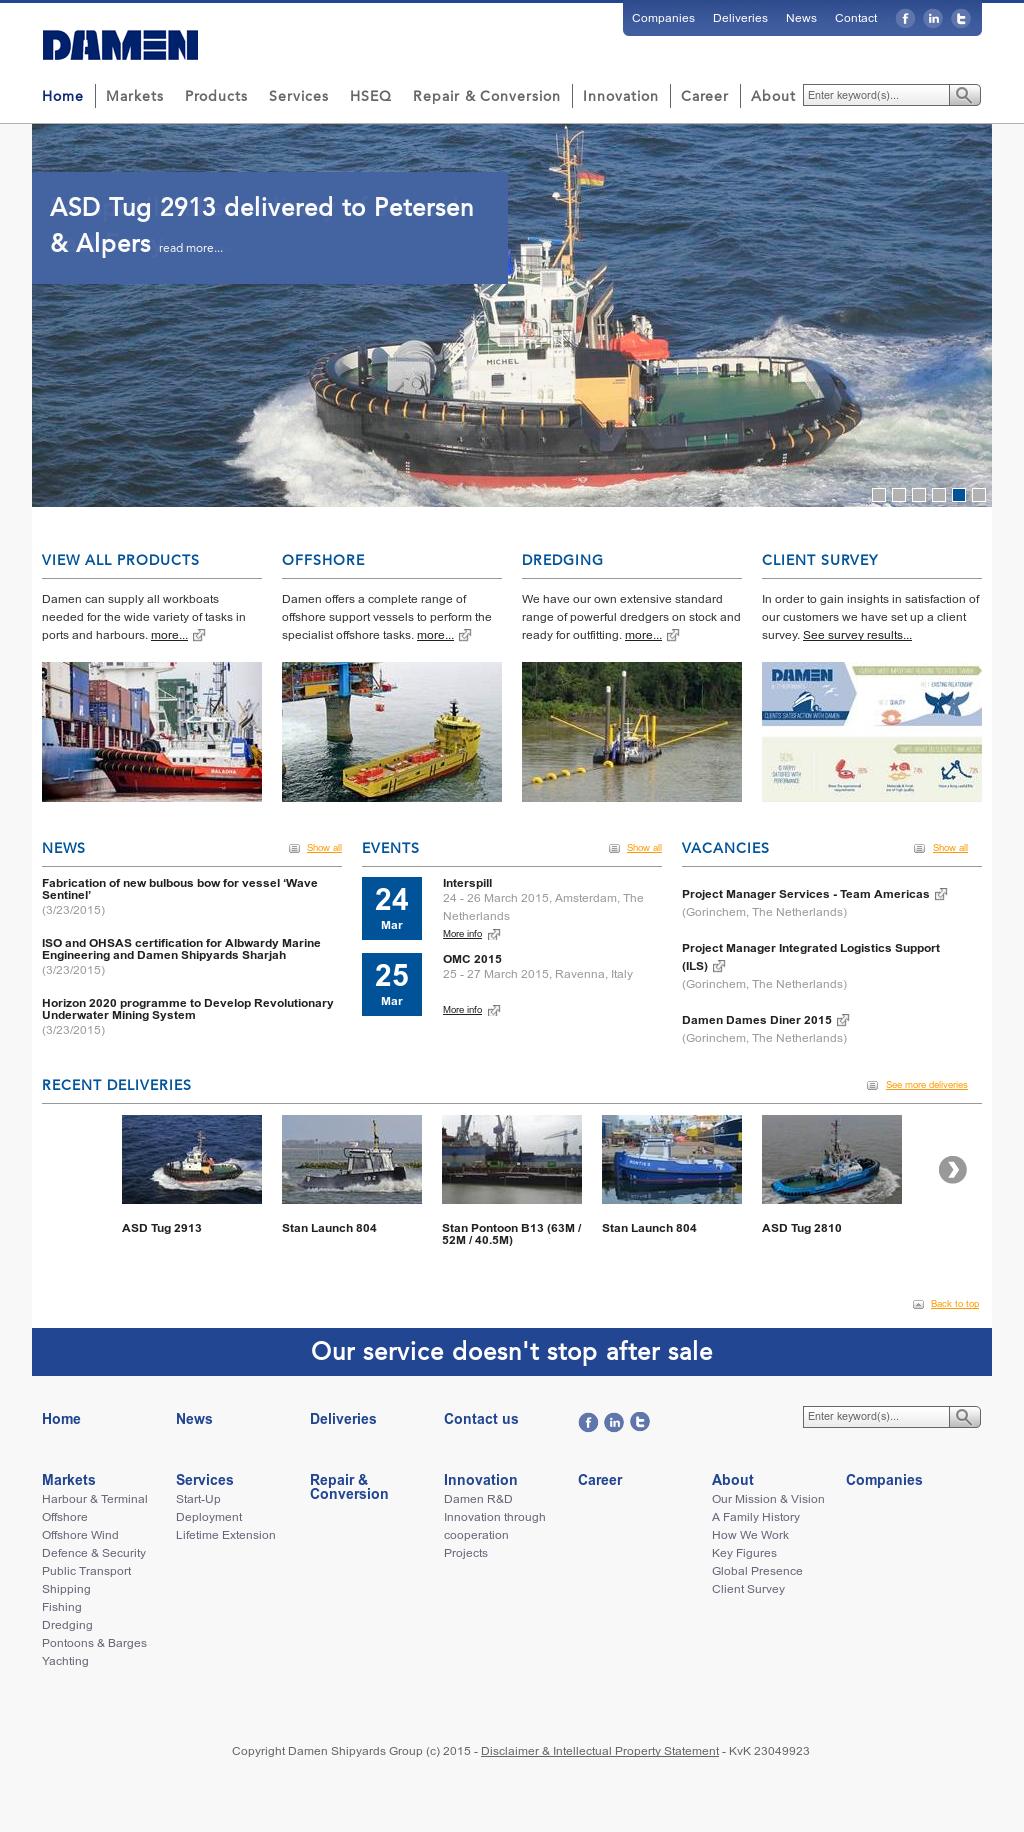 Damen Competitors, Revenue and Employees - Owler Company Profile